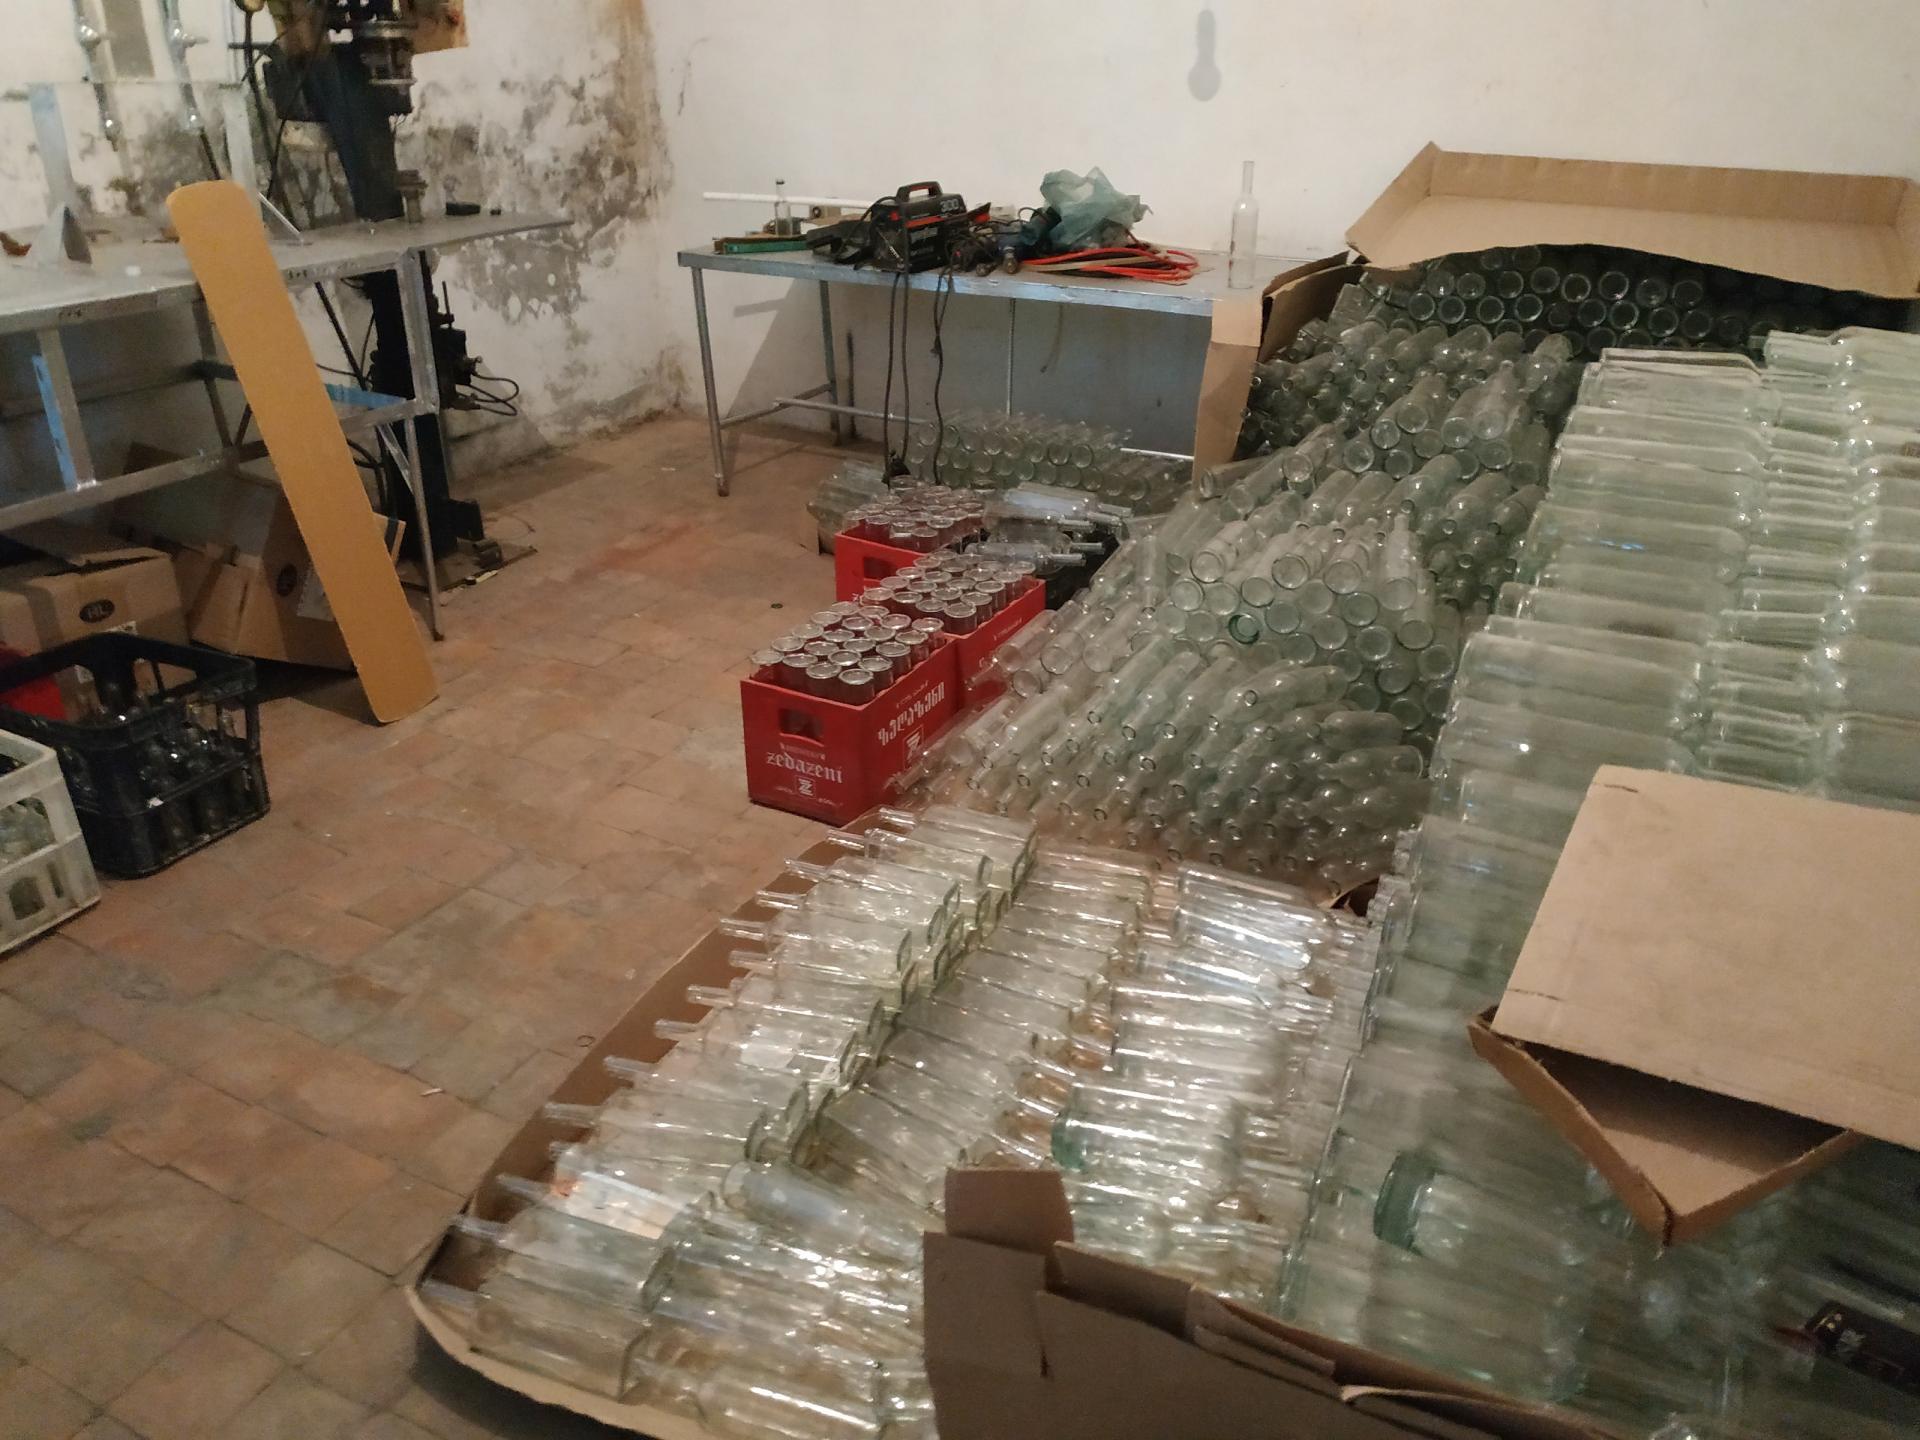 В Агстафе обнаружено предприятие по производству контрафактного алкоголя (ФОТО)